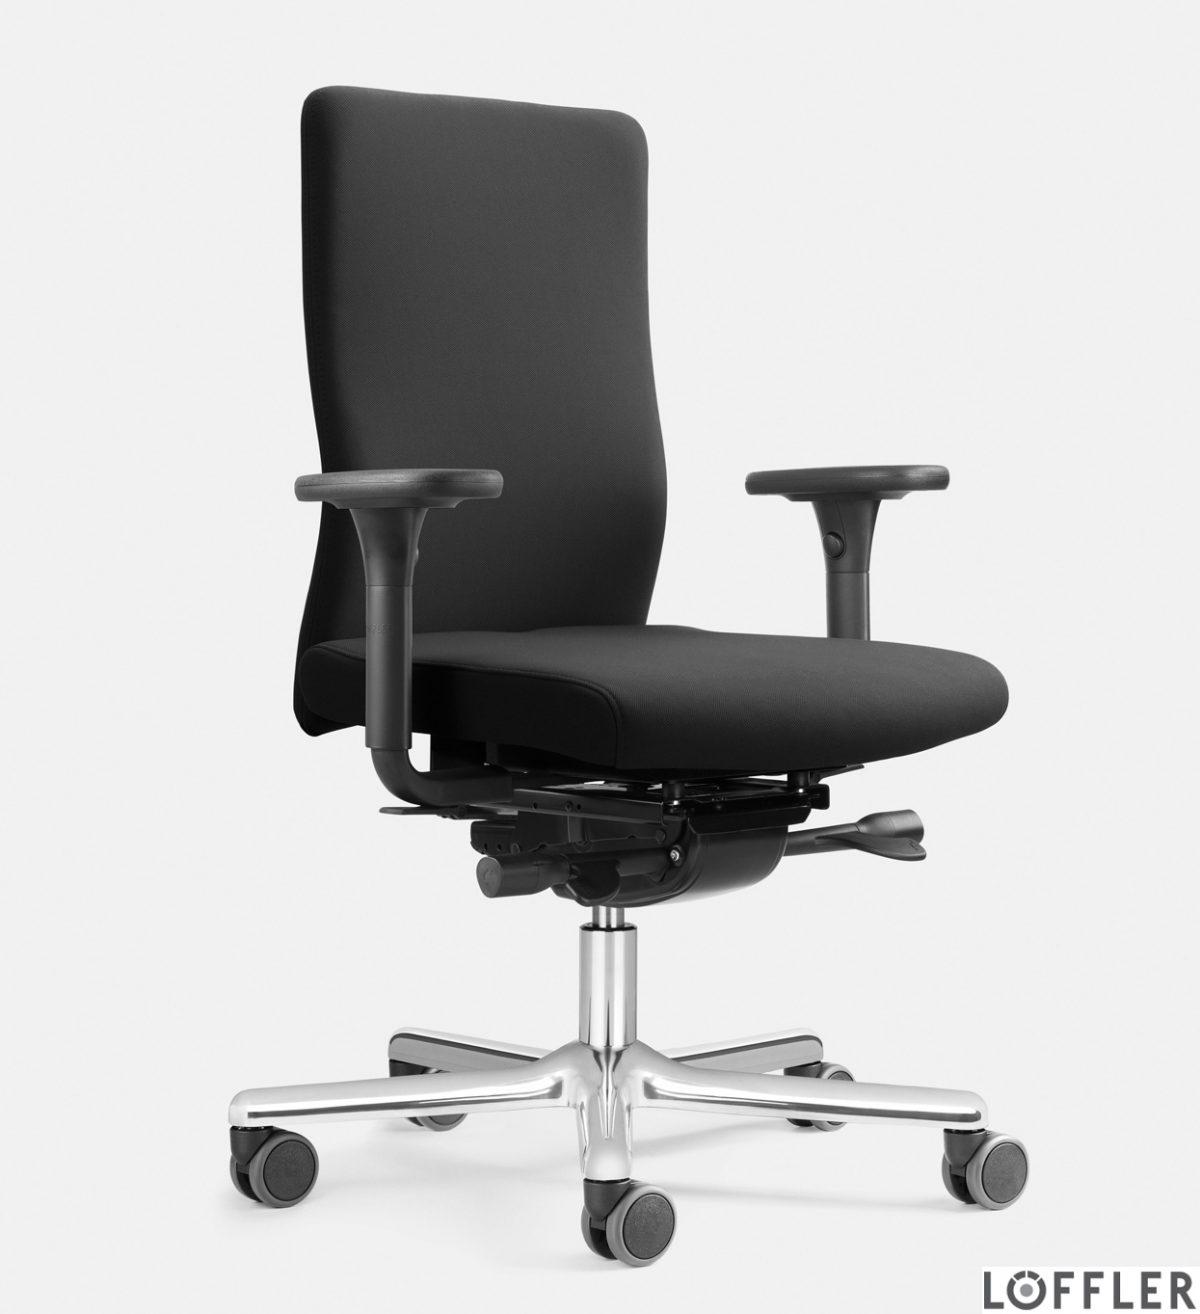 loeffler-designteam-drehstuhl-loeffler-steissbeinentlastung